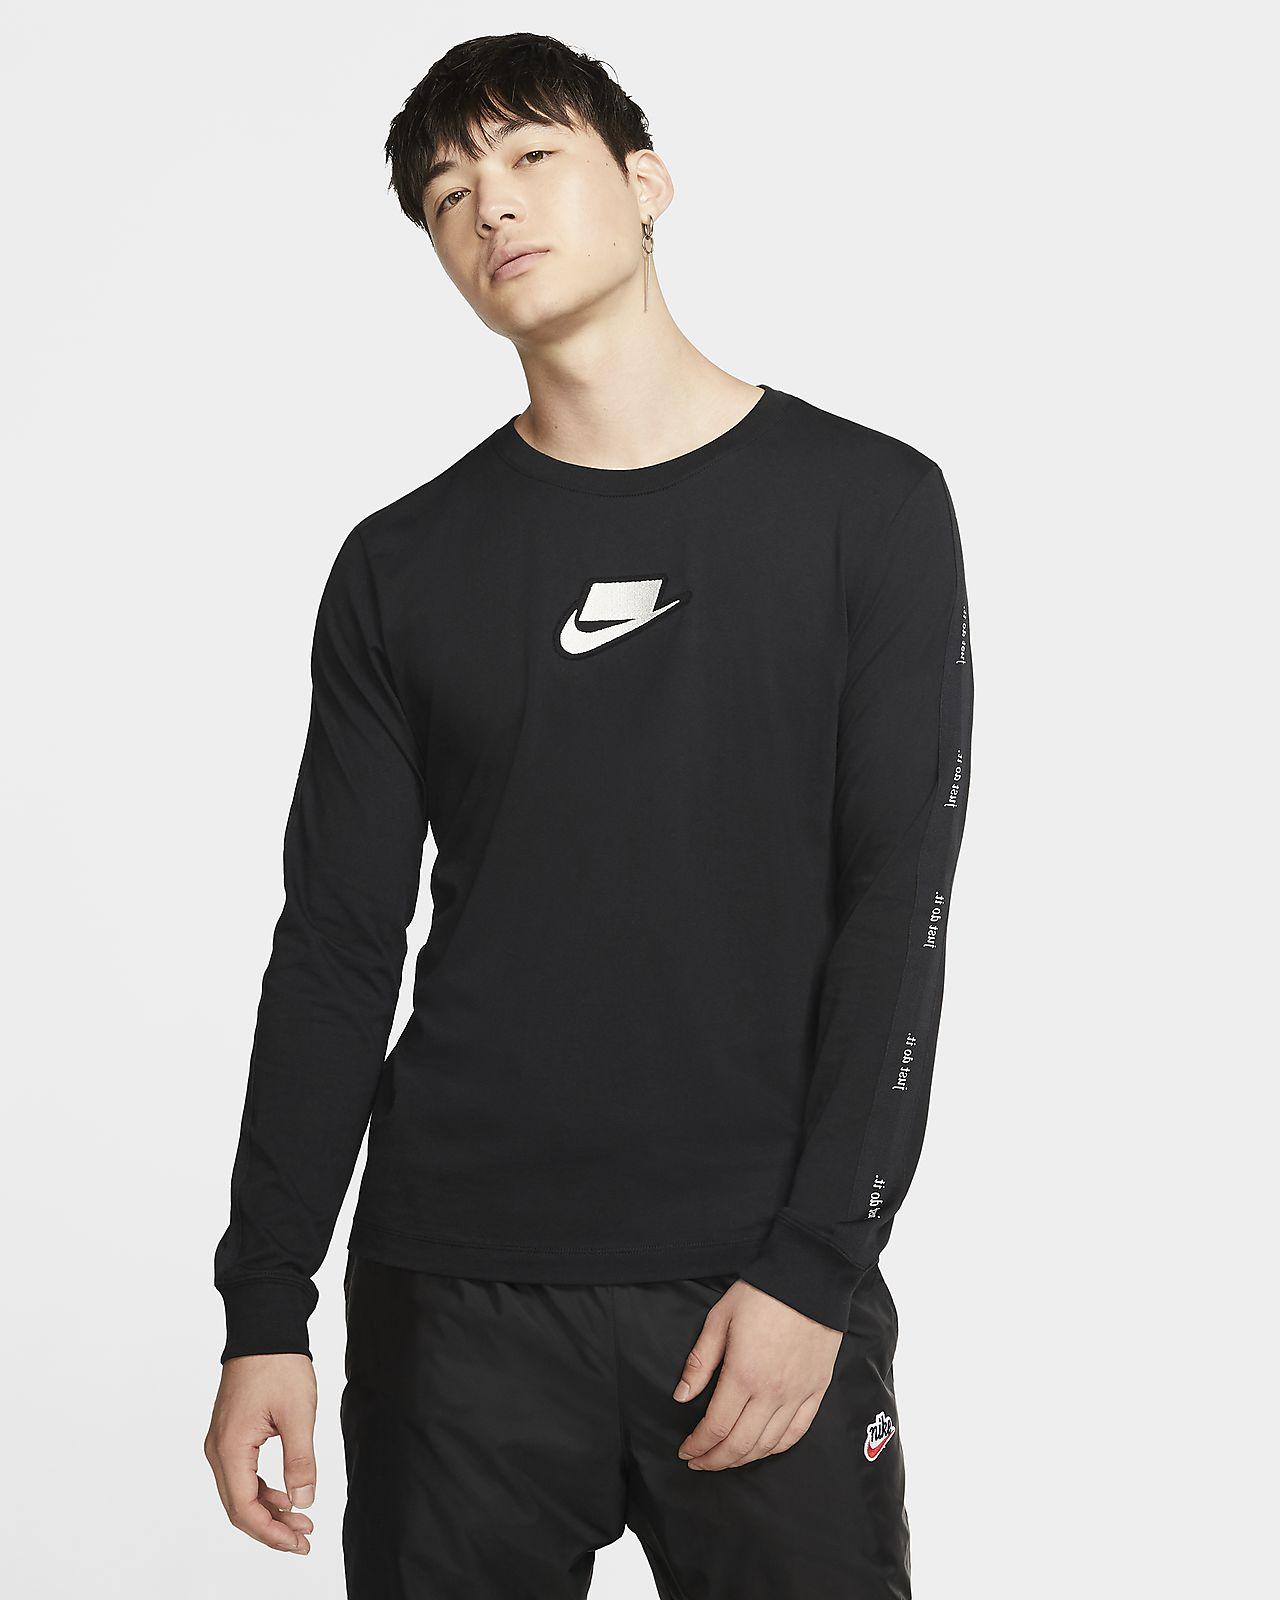 Playera de manga larga para hombre Nike Sportswear NSW